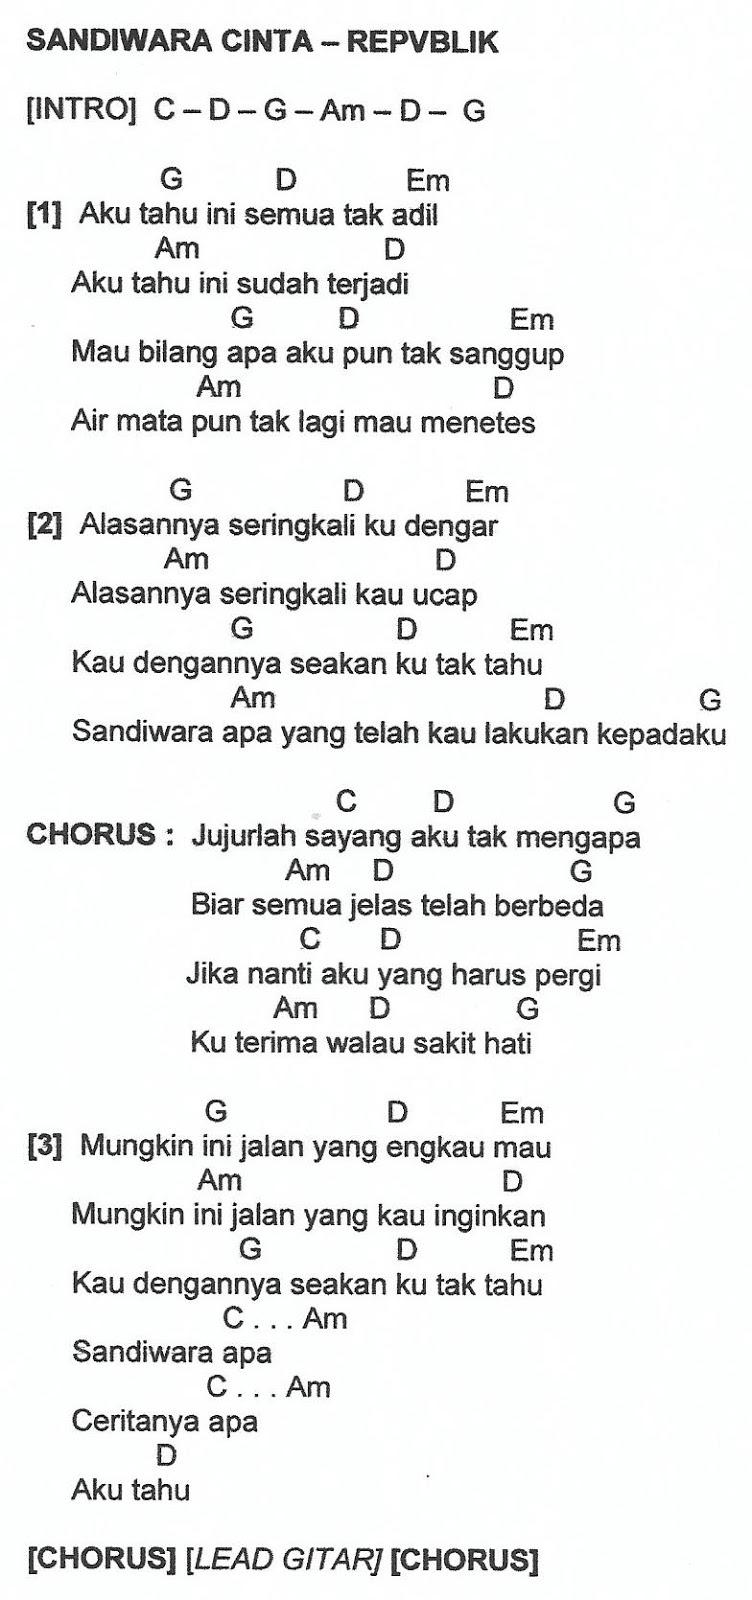 Kunci Gitar Lagu Sandiwara Cinta : kunci, gitar, sandiwara, cinta, شفاف, داكن, منطقة, Chord, Gitar, Ardila, Sandiwara, Cinta, Dsvdedommel.com